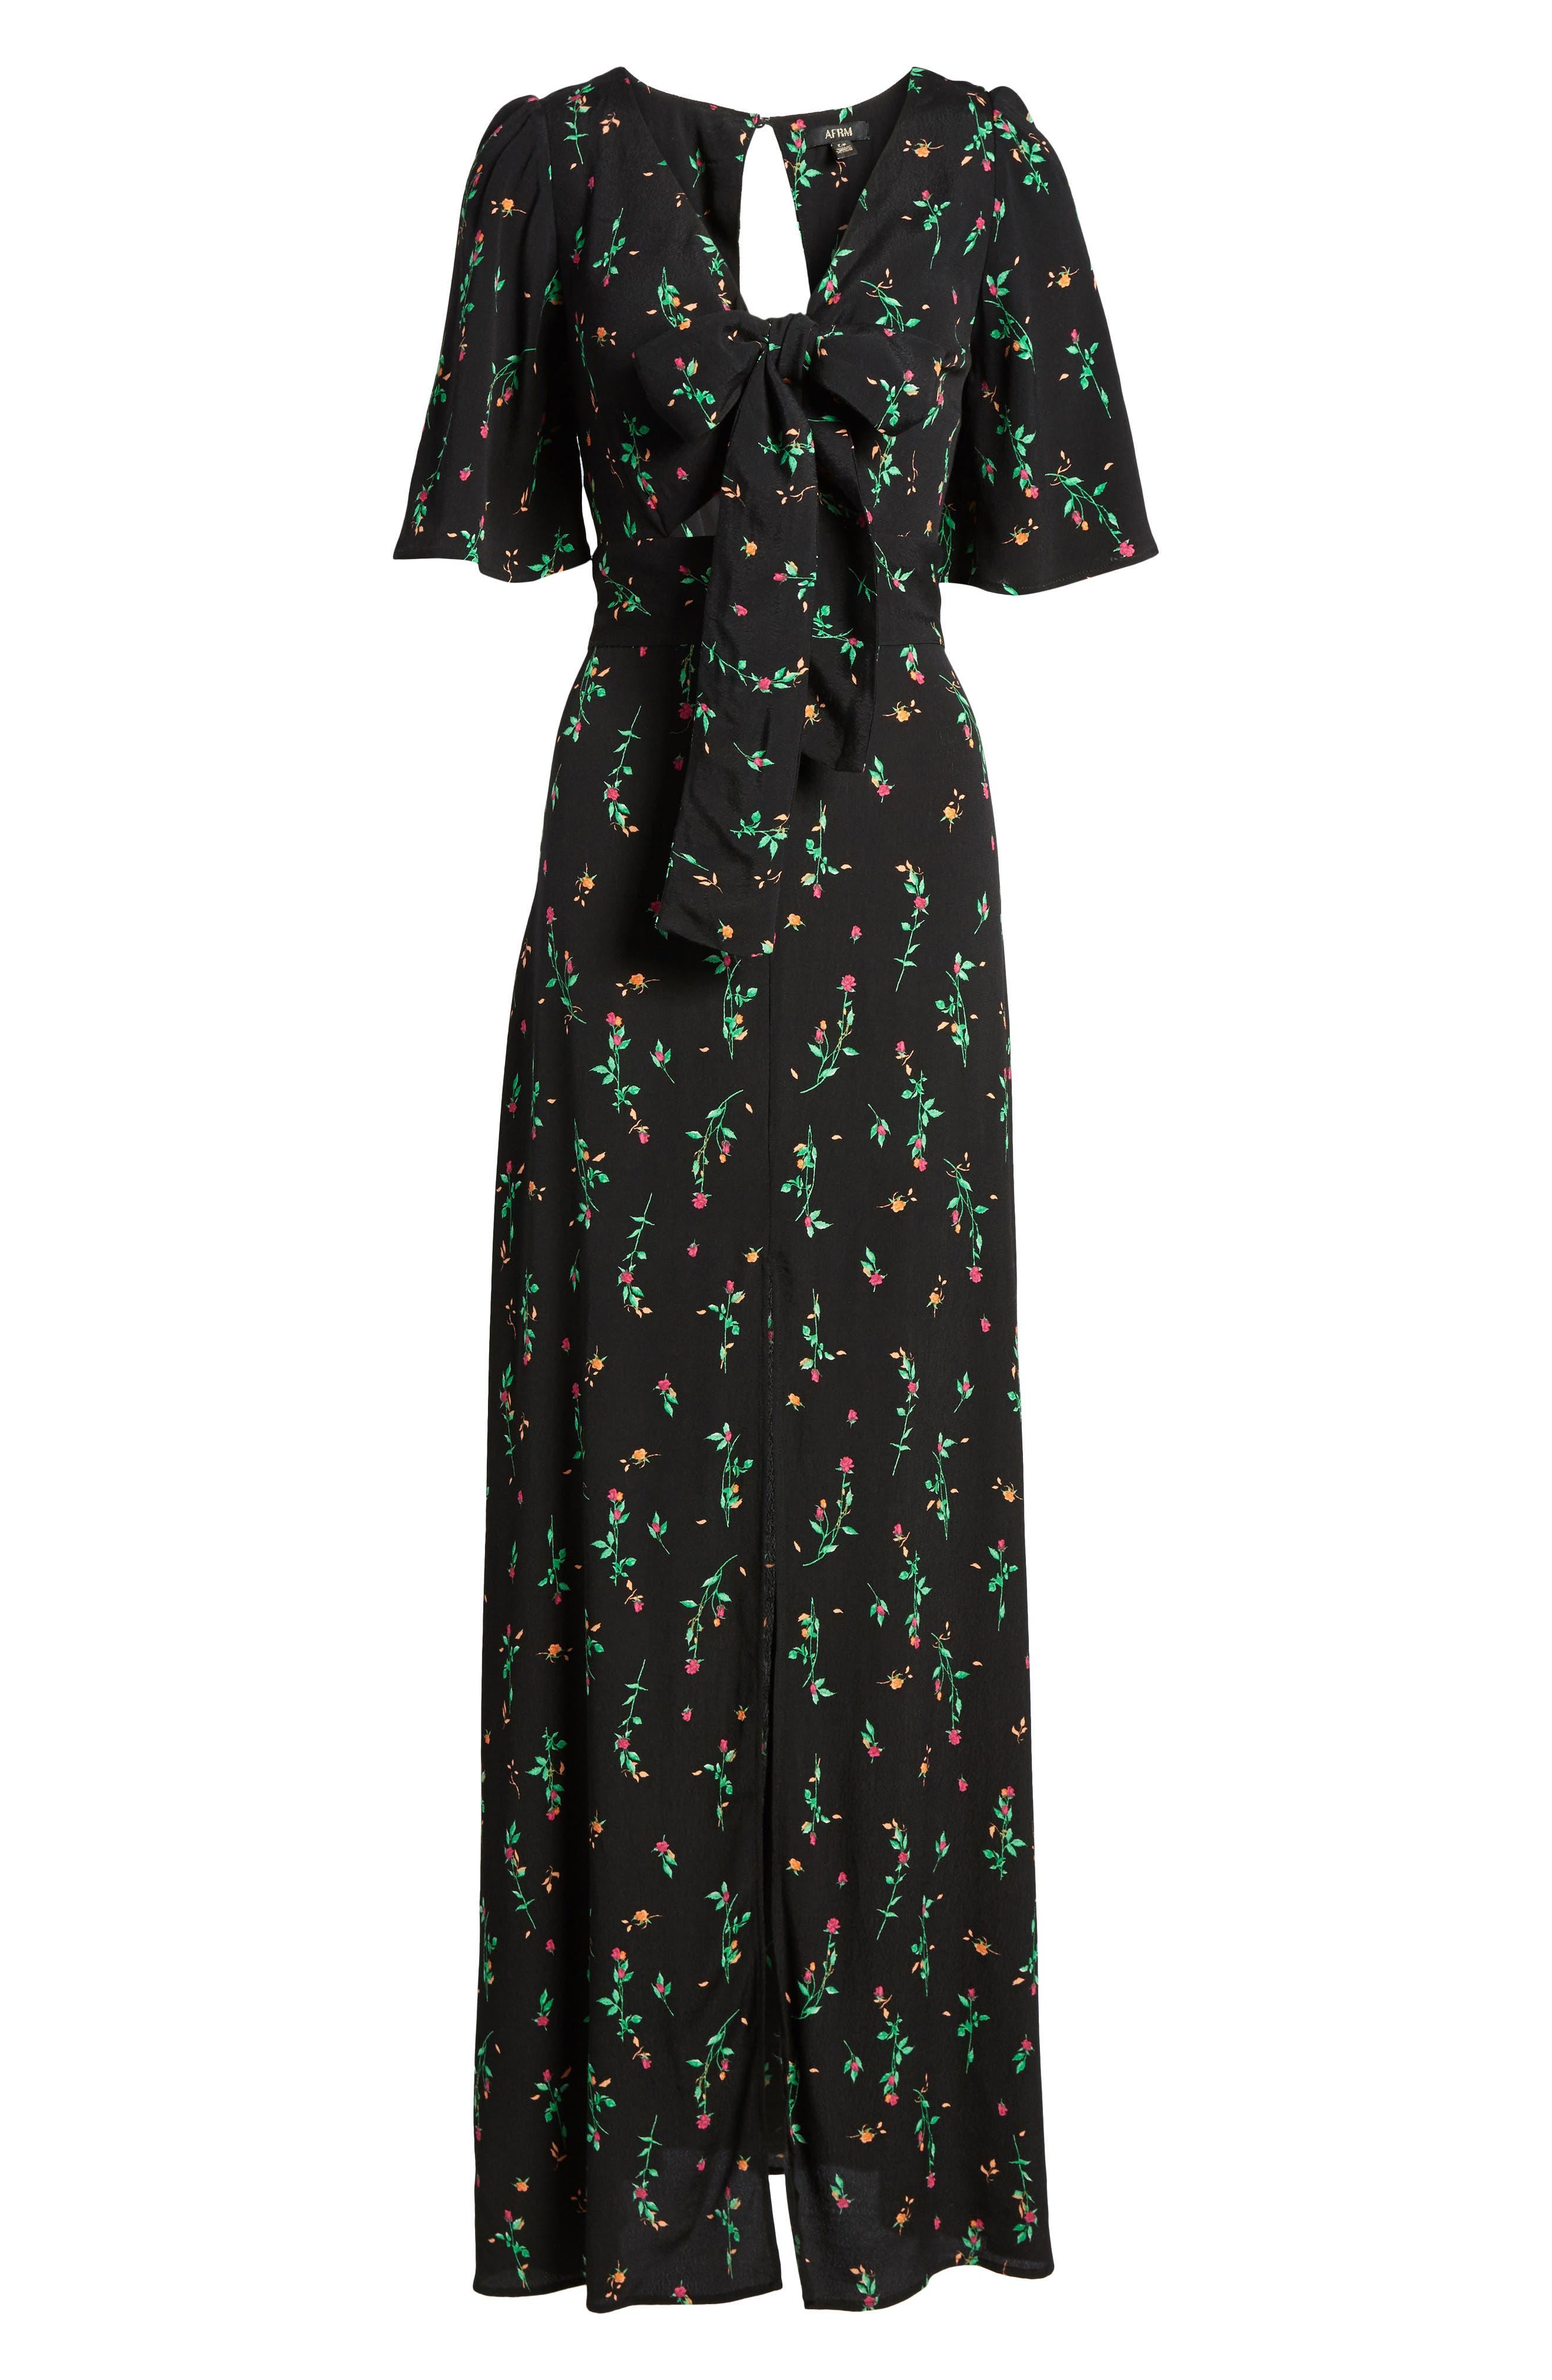 Ramon Tie Front Maxi Dress,                             Alternate thumbnail 6, color,                             Noir Rose Ditsy